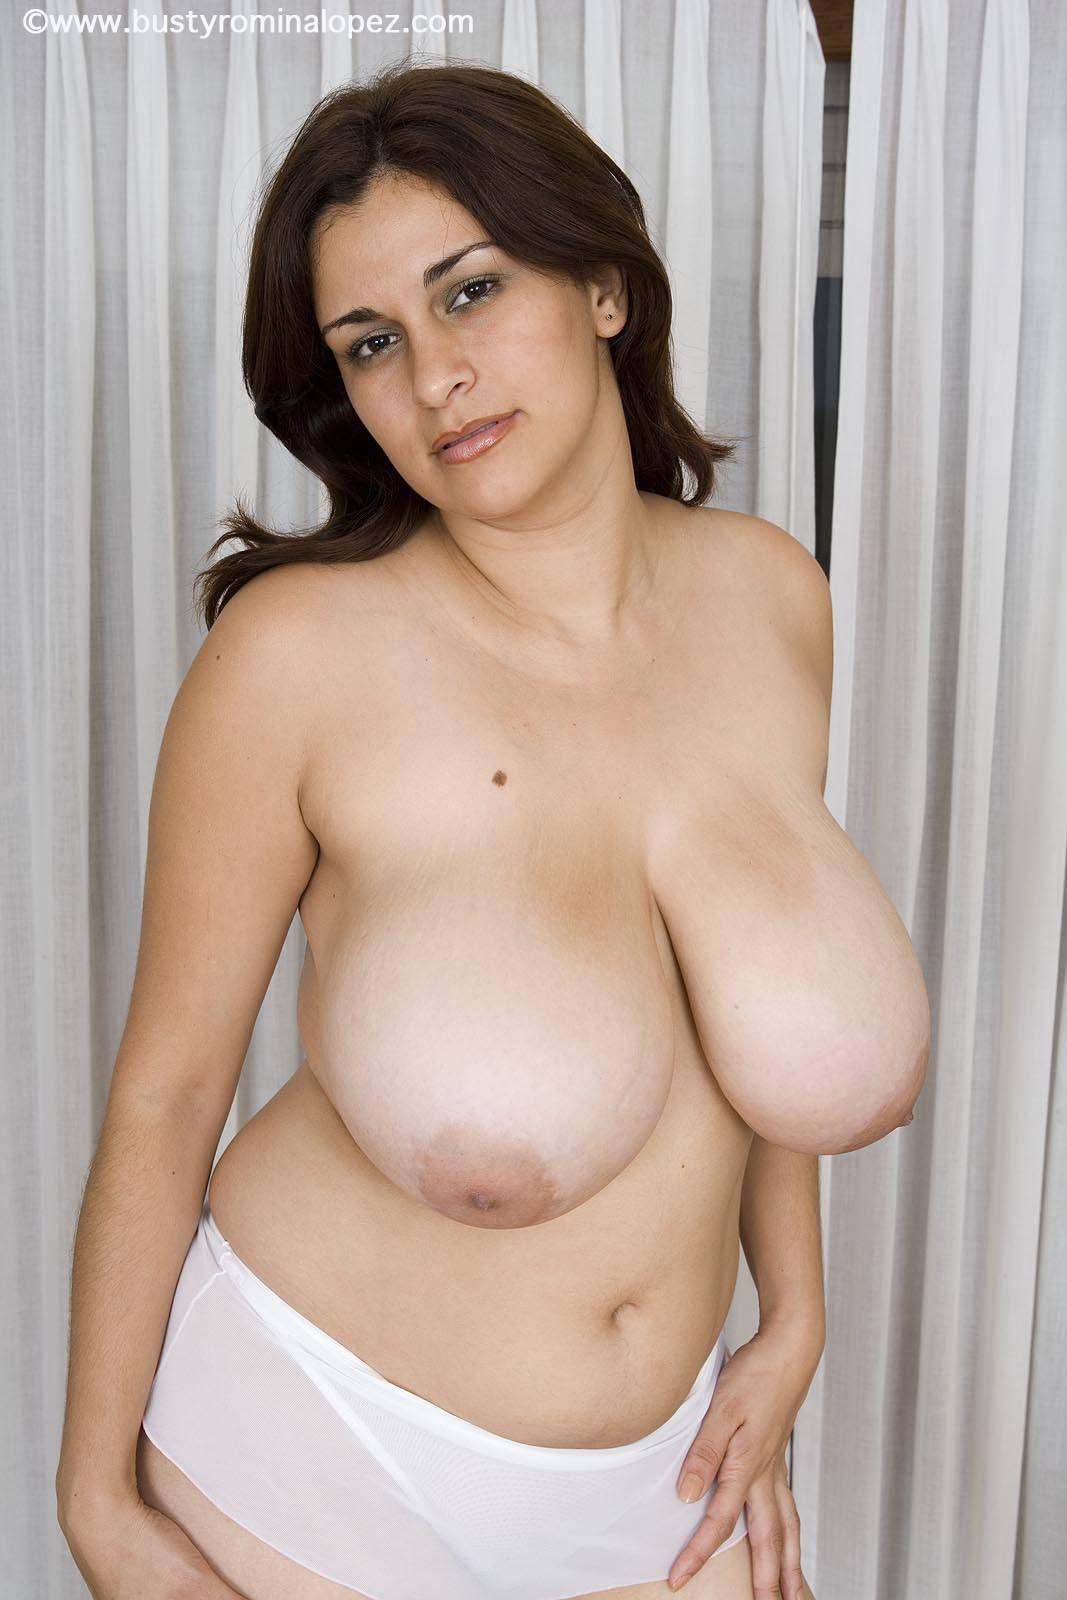 Big fat tits tumblr